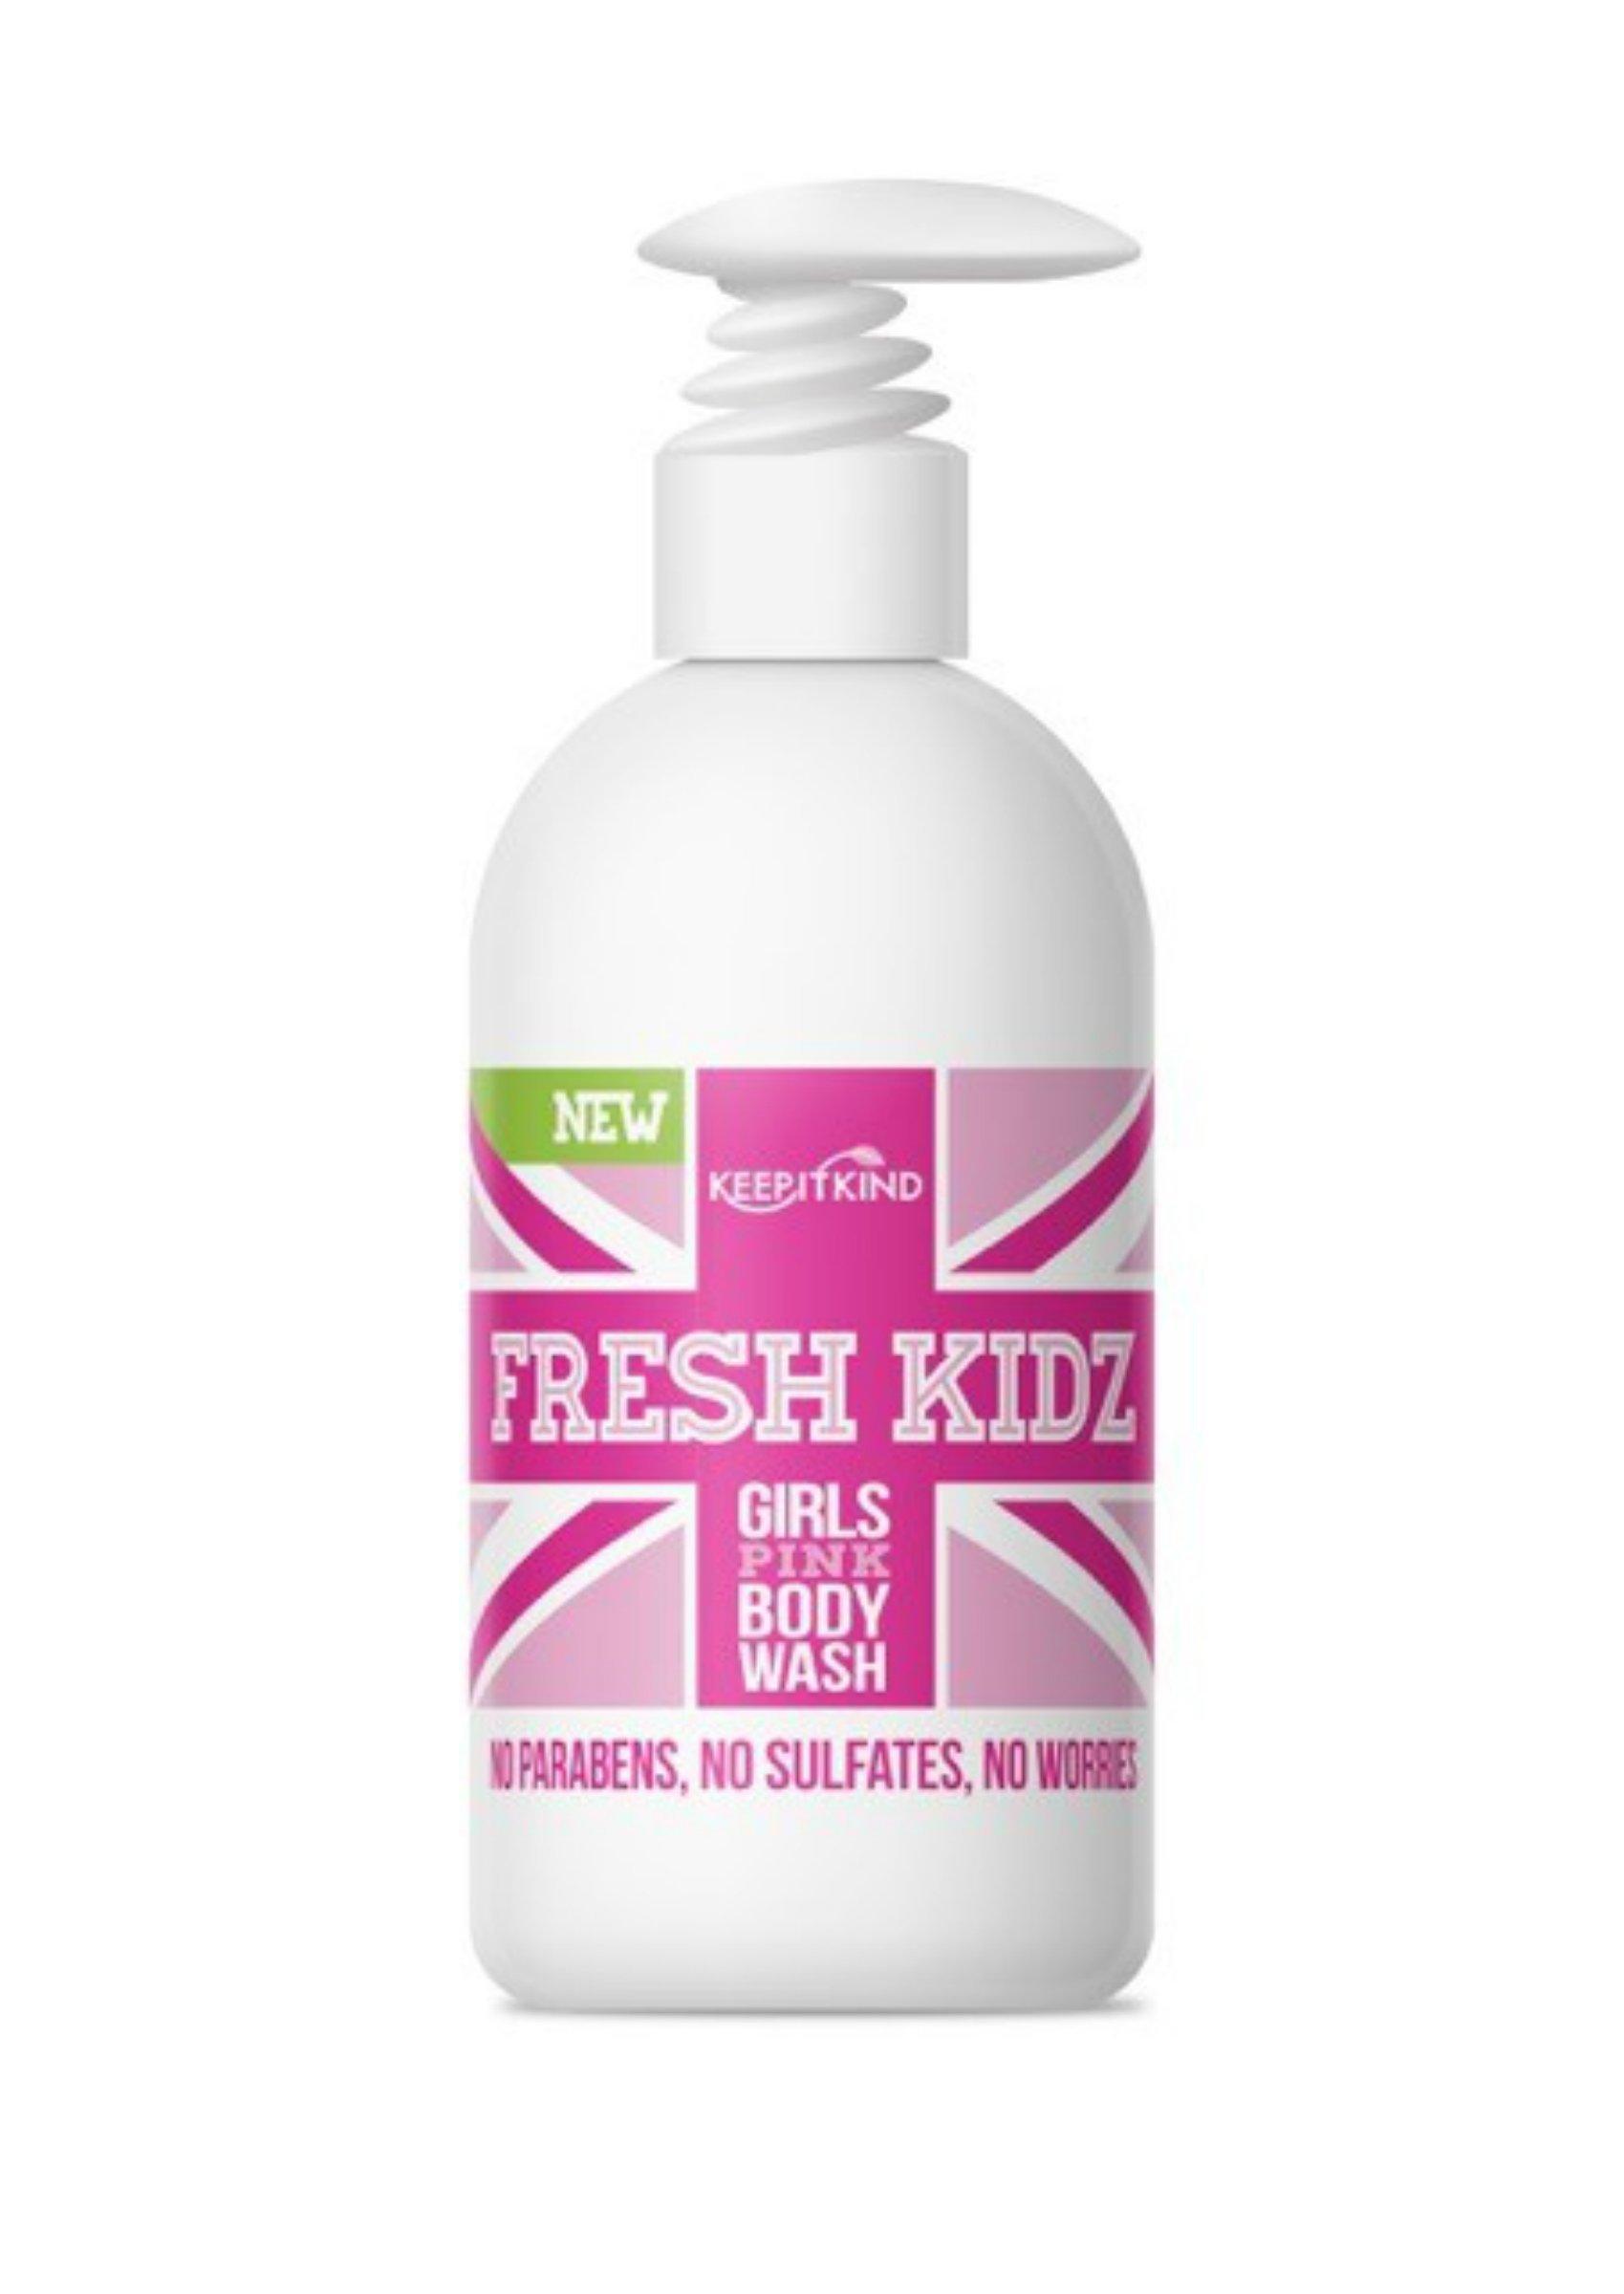 "Keep It Kind Fresh Kidz Natural Body Wash - Girls""Pink"", 16.9 fl.oz."